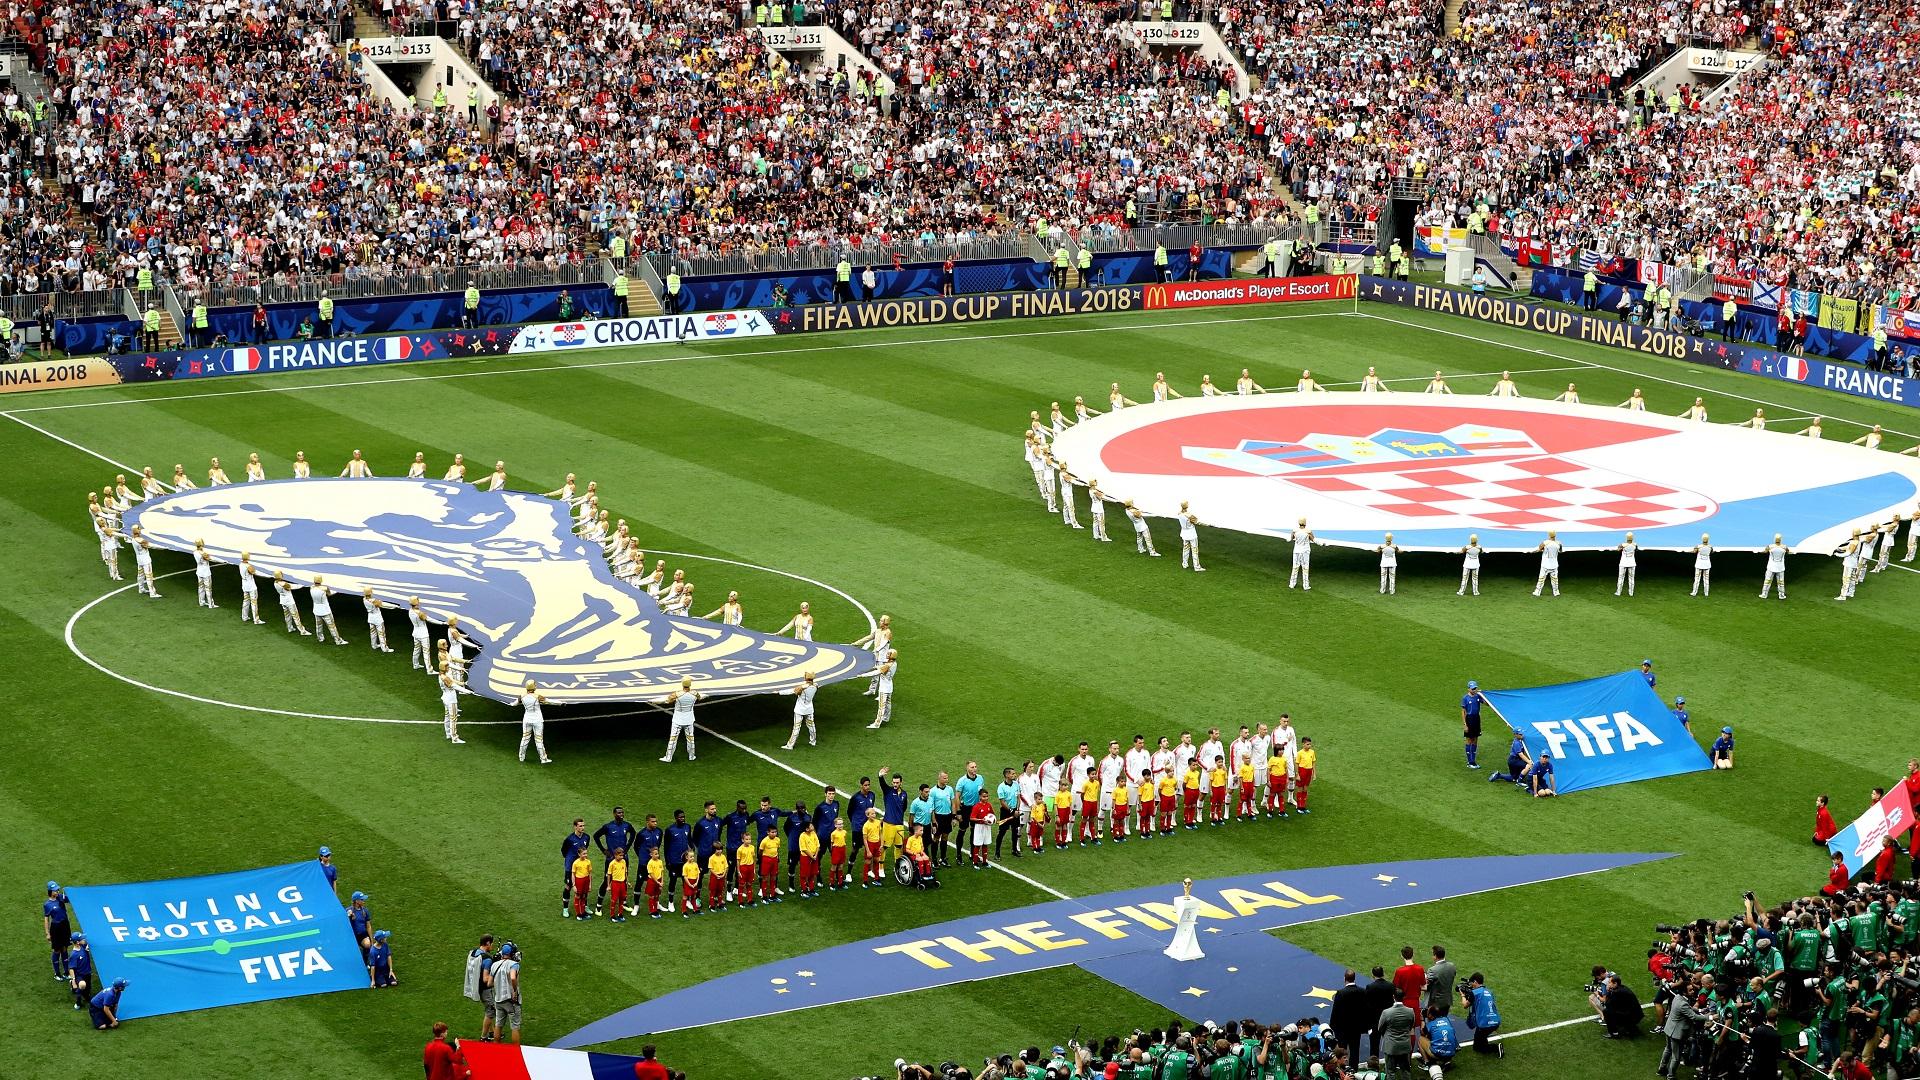 World Cup Final 2018 84